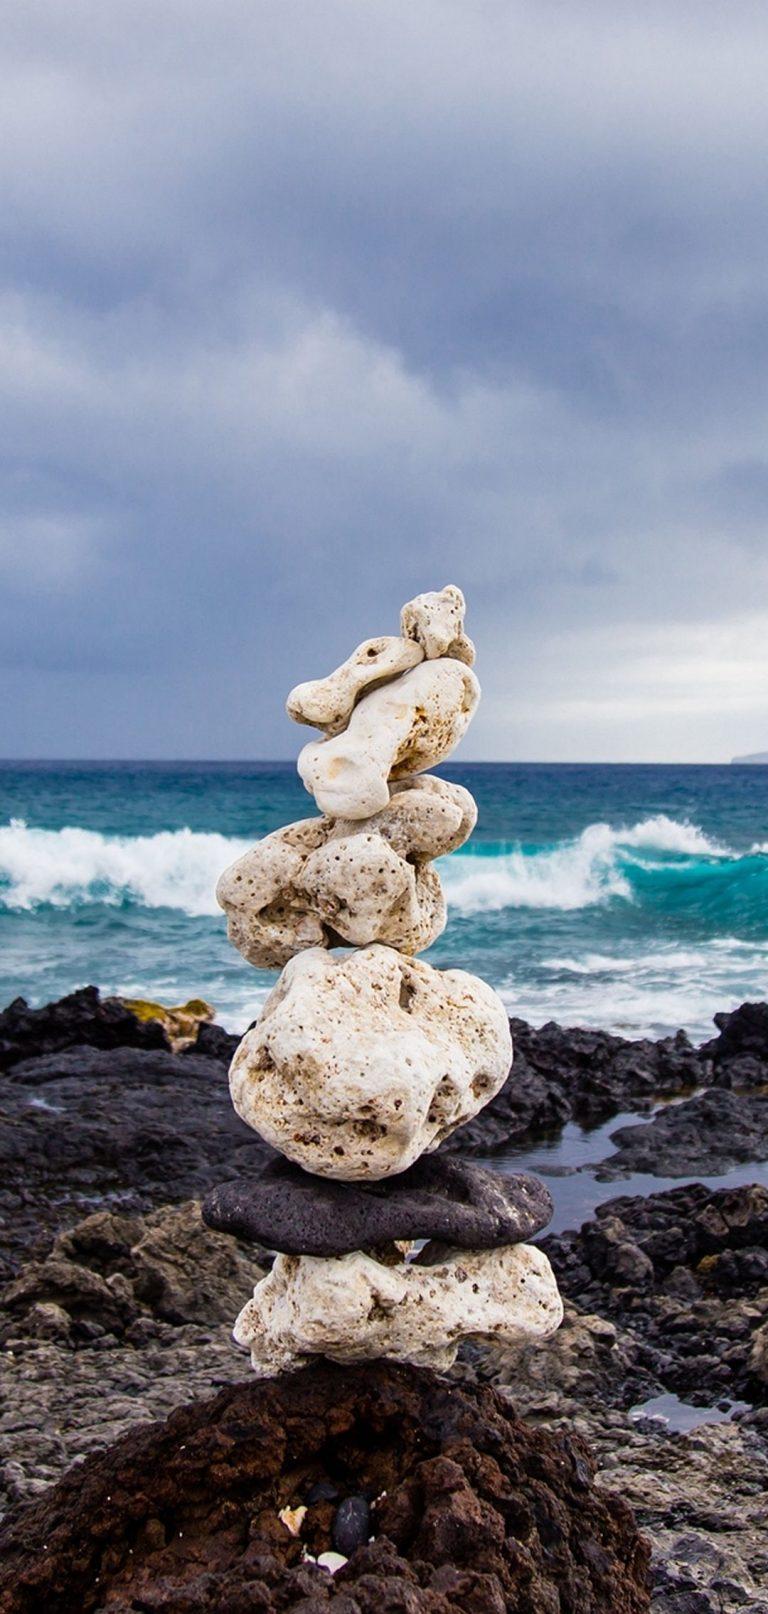 Sea Beach Stones 1080x2270 768x1614